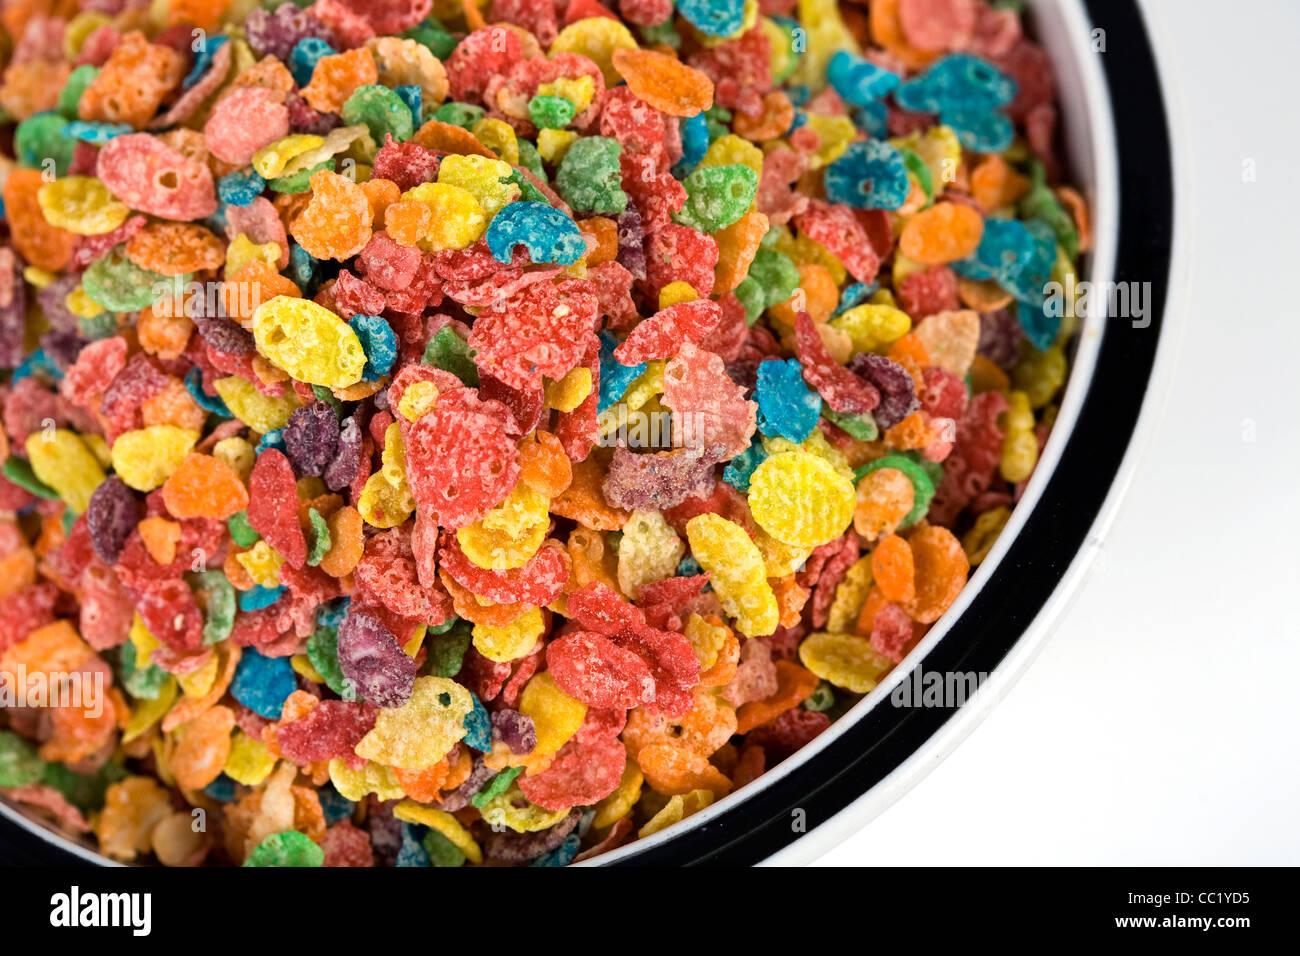 Fruity Pebbles breakfast cereal. - Stock Image